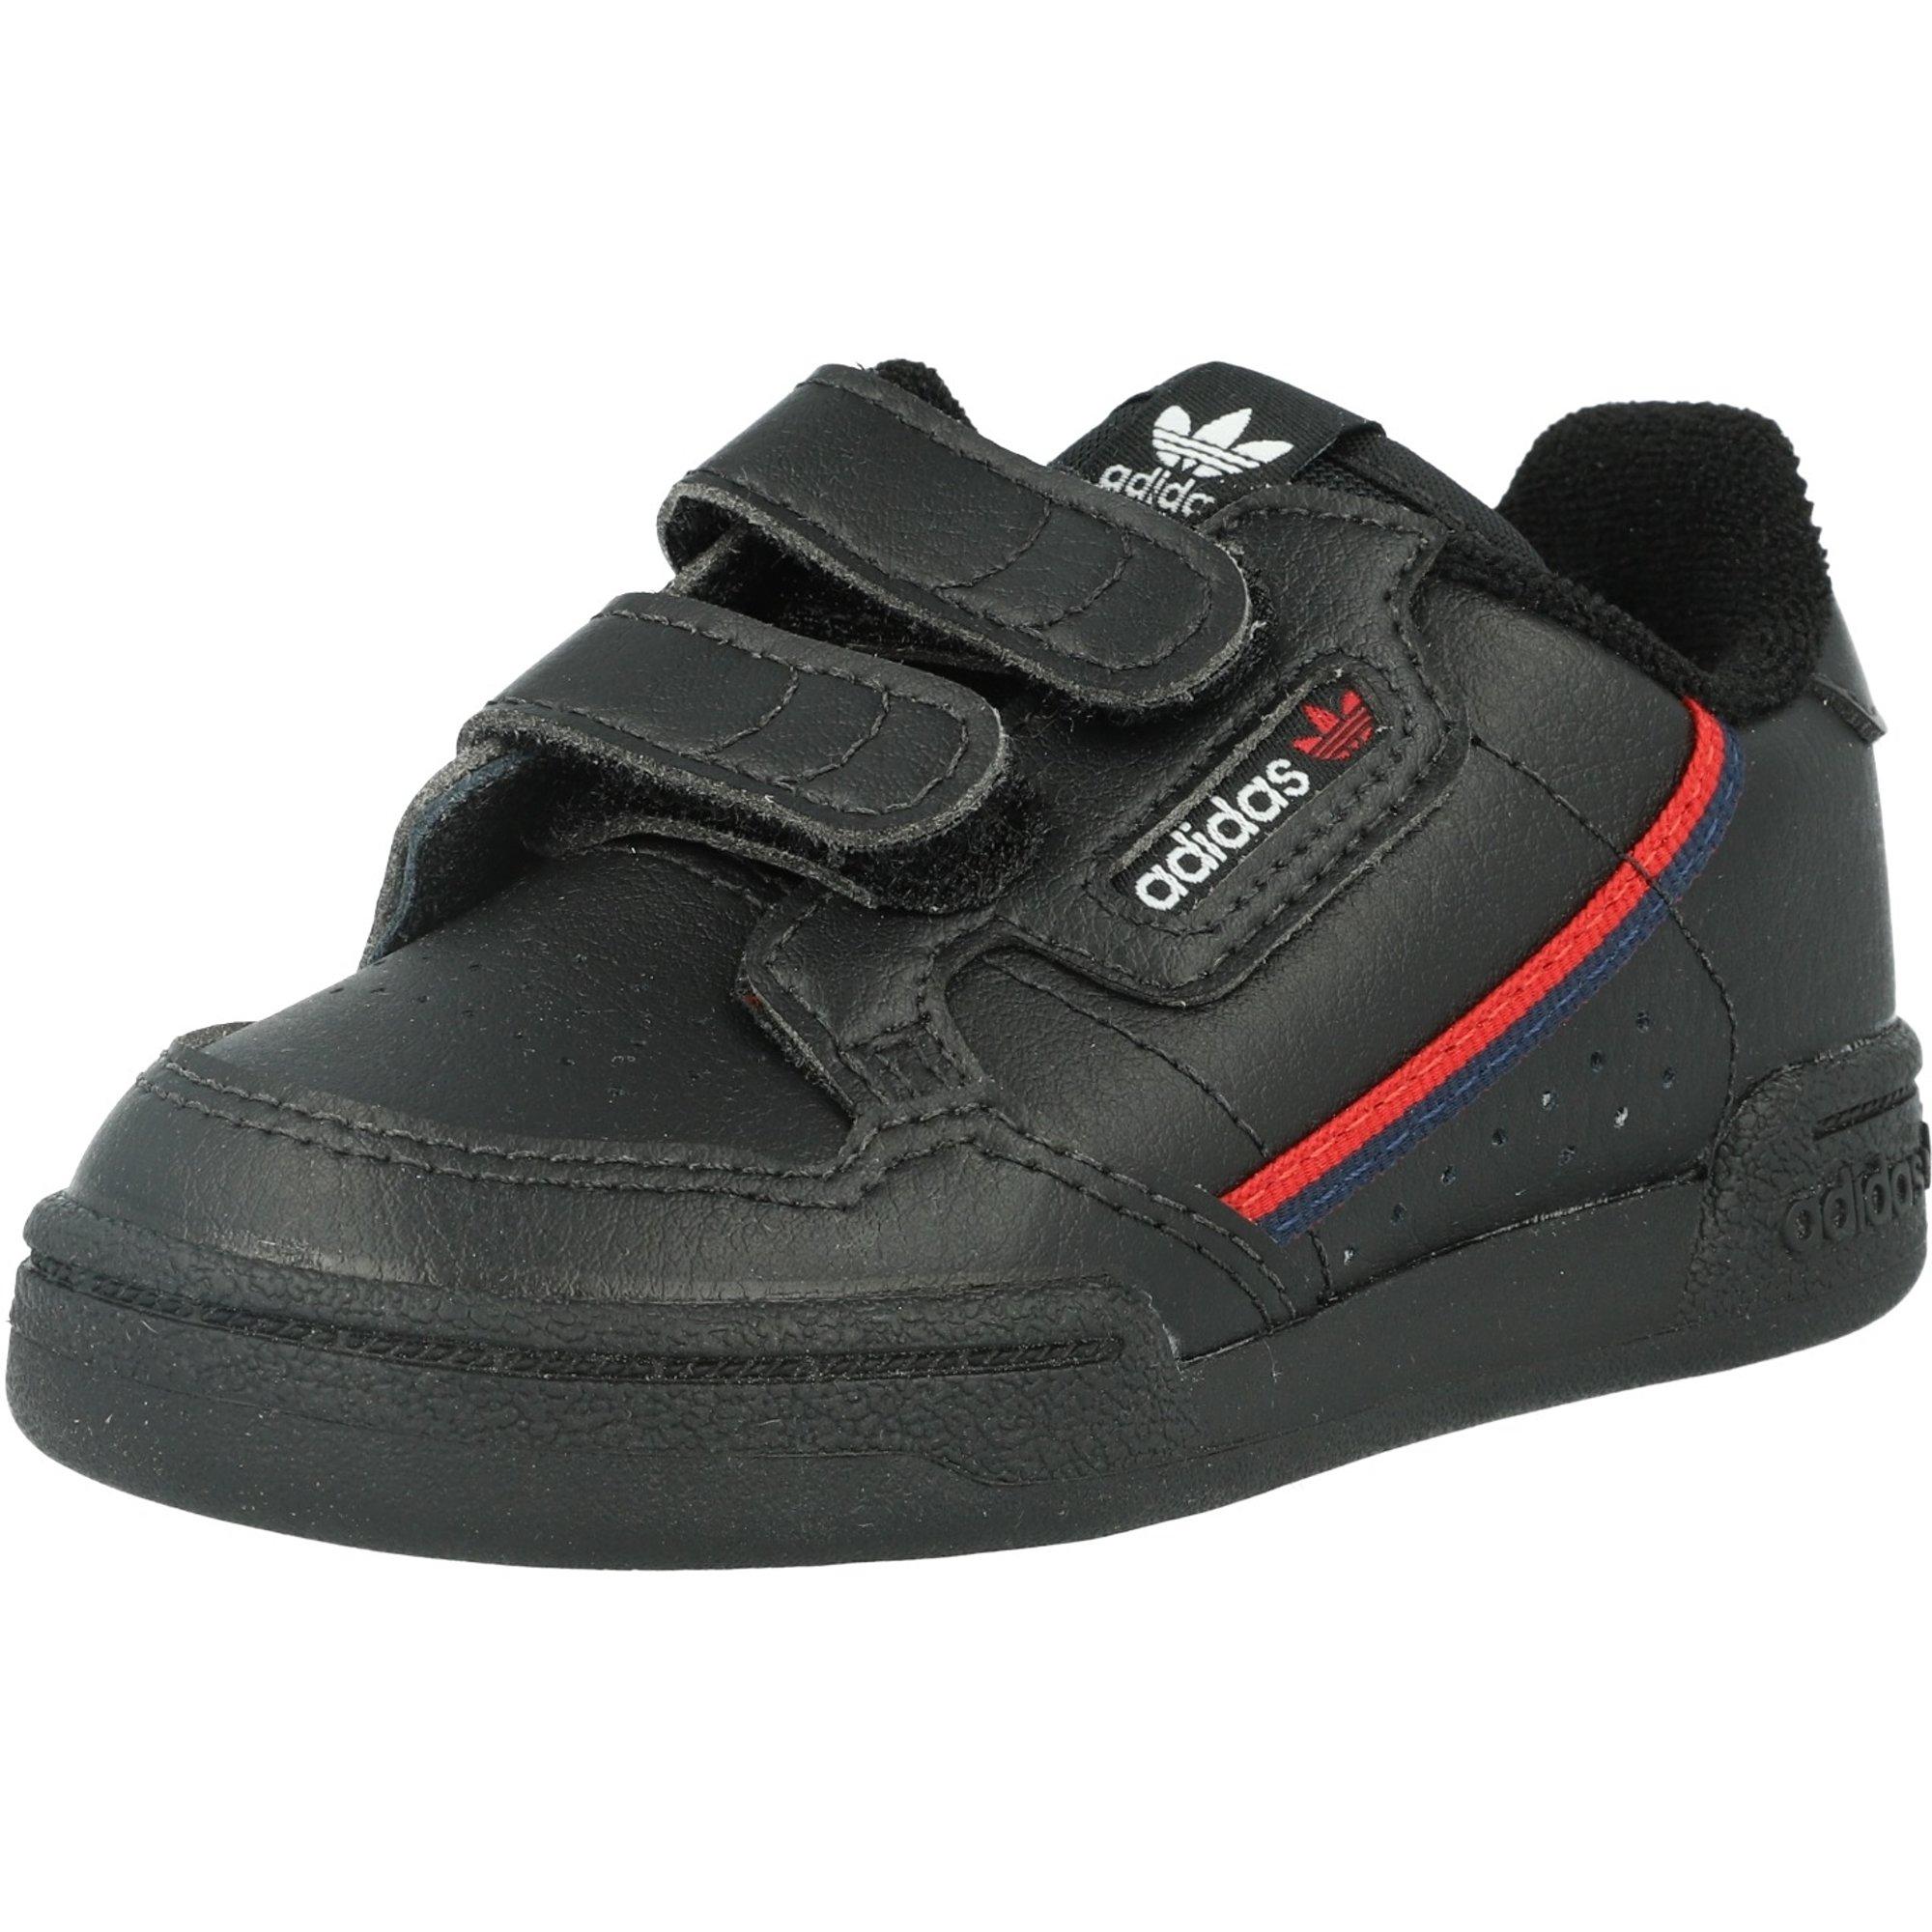 adidas Originals Continental 80 CF I Black/Scarlet Leather Infant